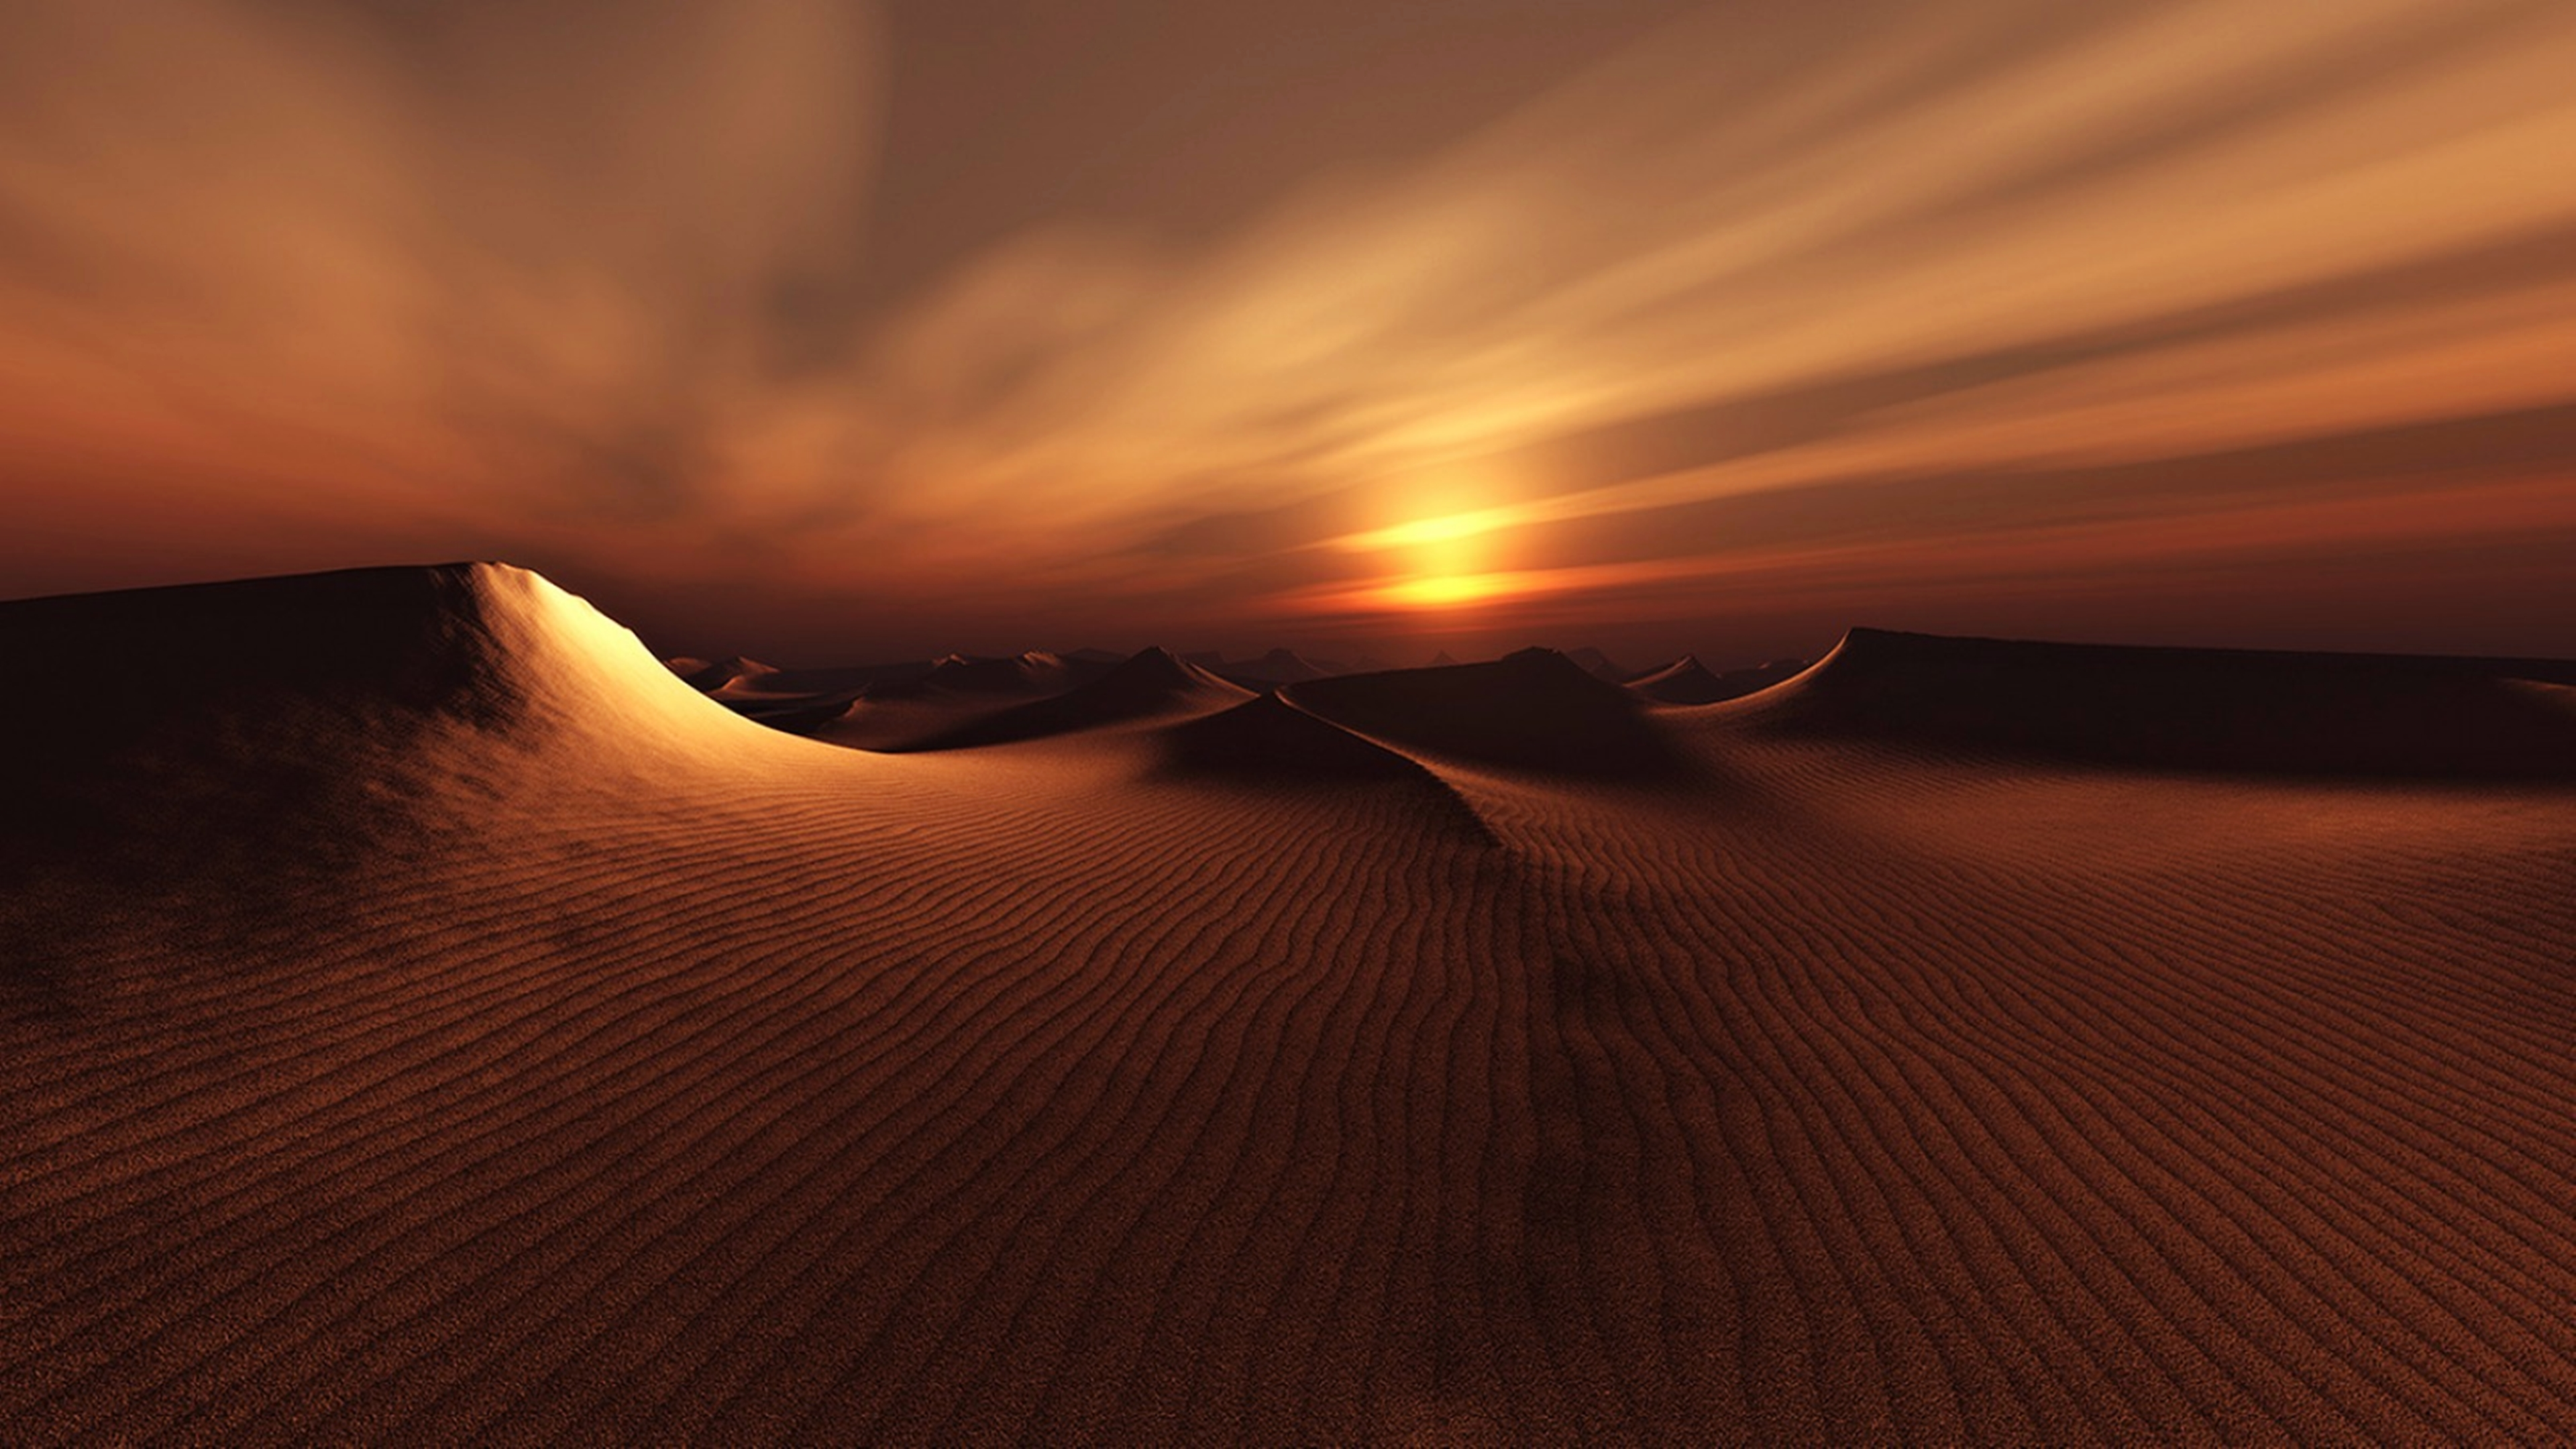 desert 4k ultra hd wallpaper | background image | 3840x2160 | id